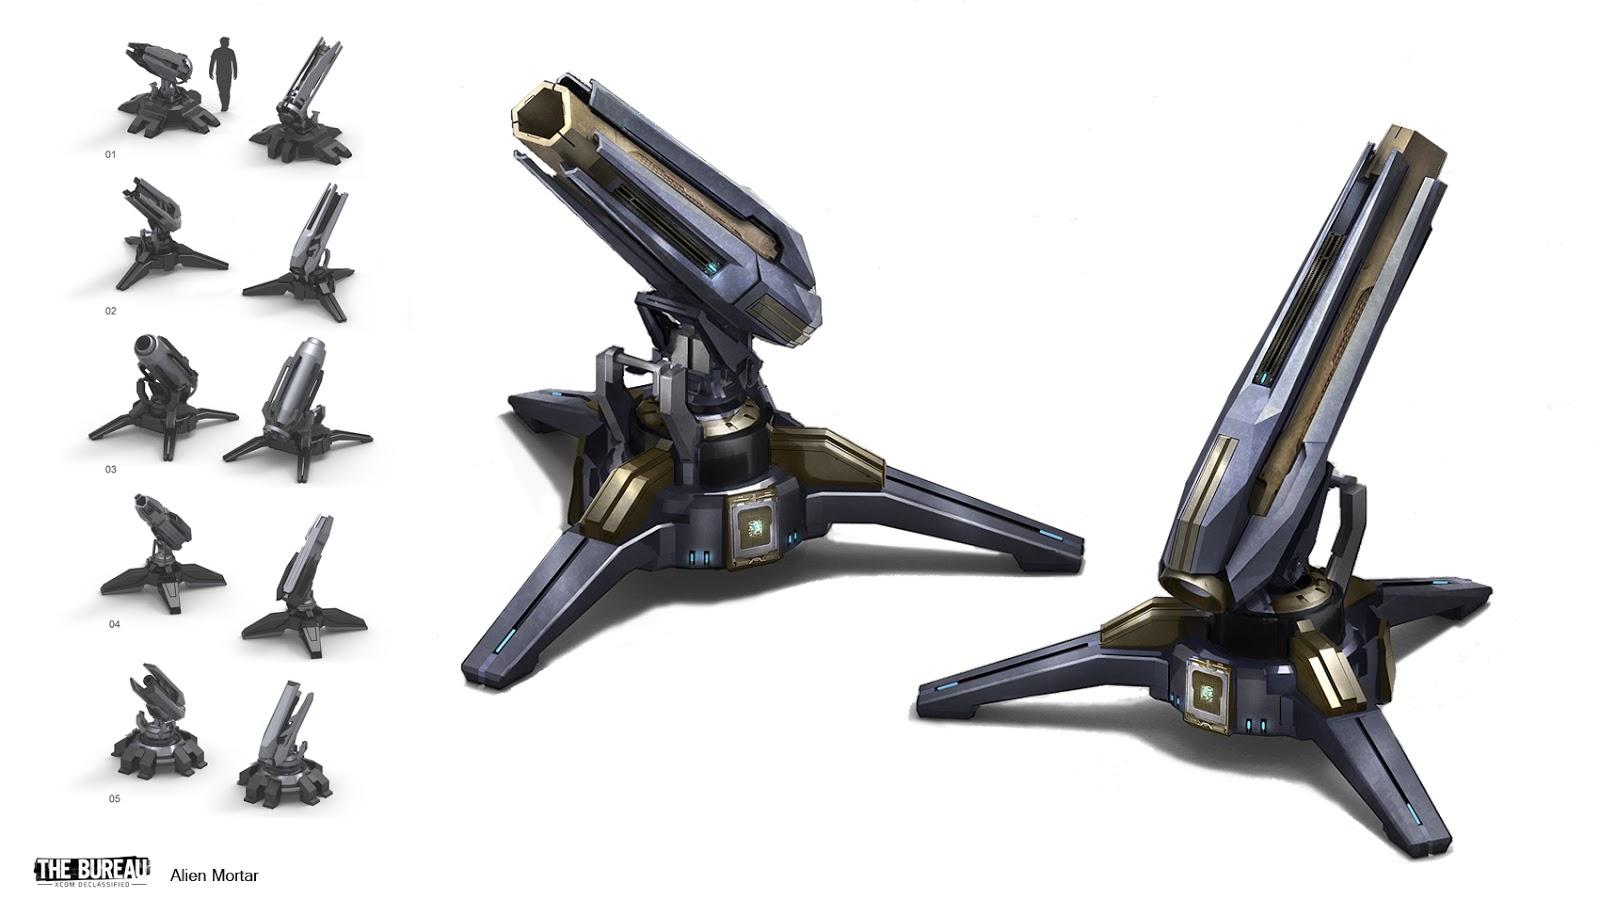 sam brown the bureau xcom declassified weapons. Black Bedroom Furniture Sets. Home Design Ideas